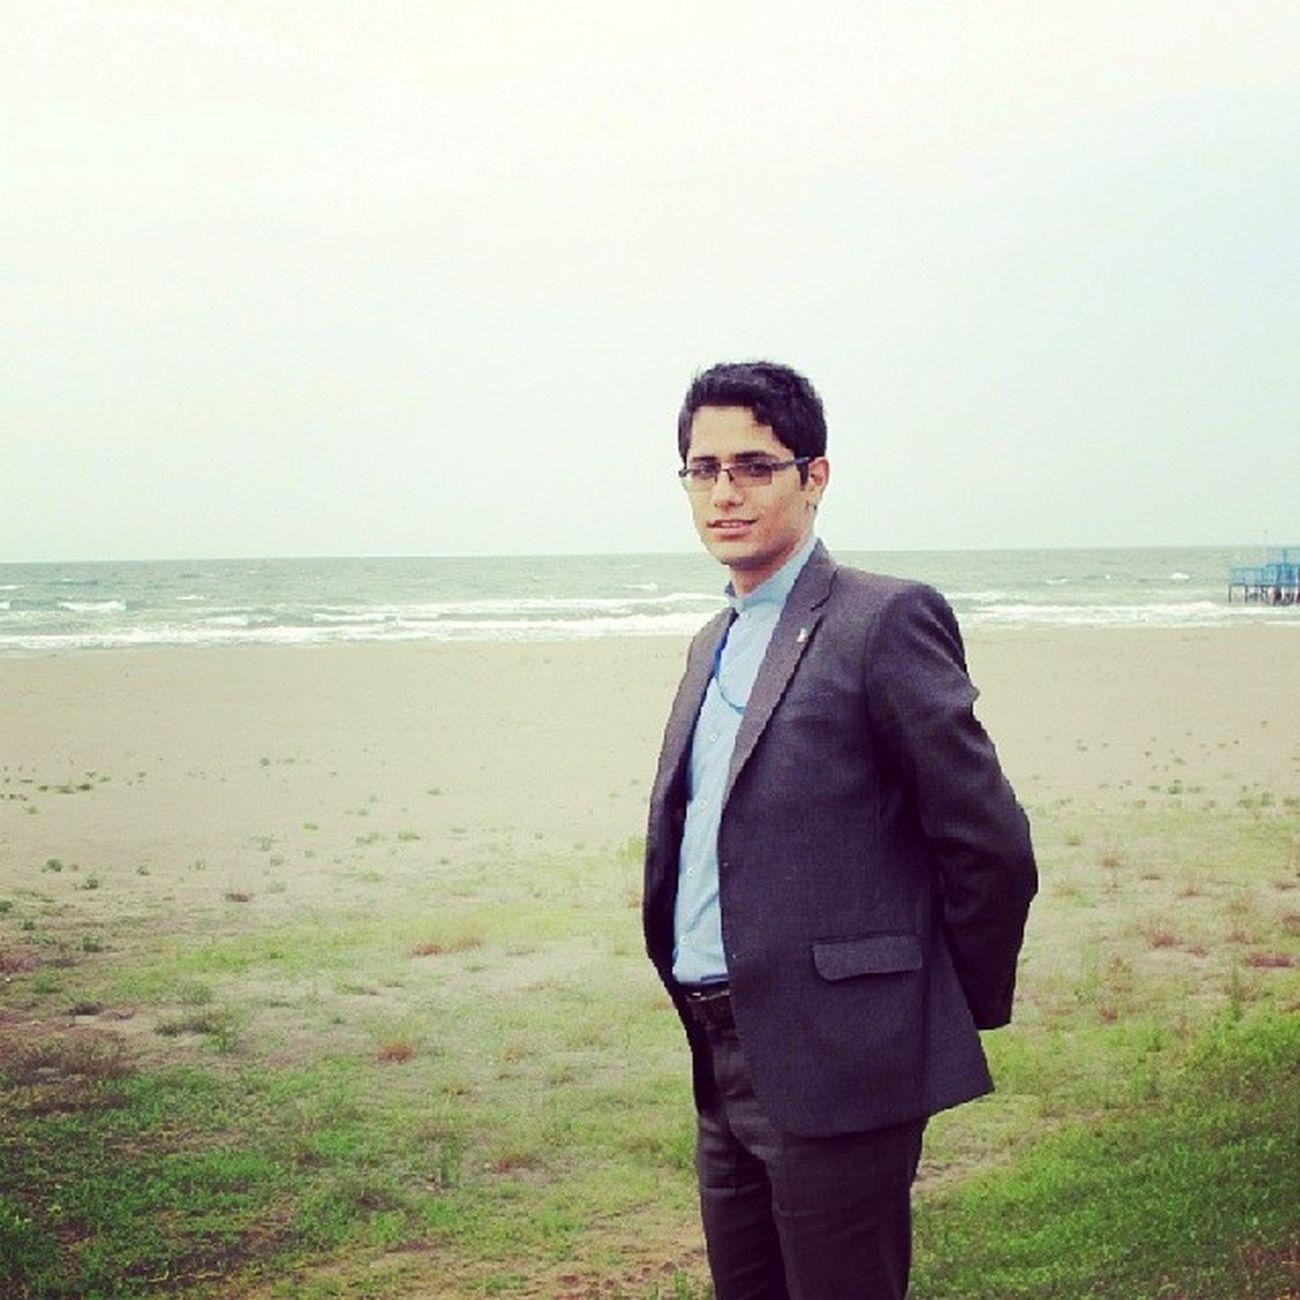 Ziba kenar Navid Kamali Navidkamali نوید_کمالی Nkamali_ir Smart_city Smartcity Smartcities